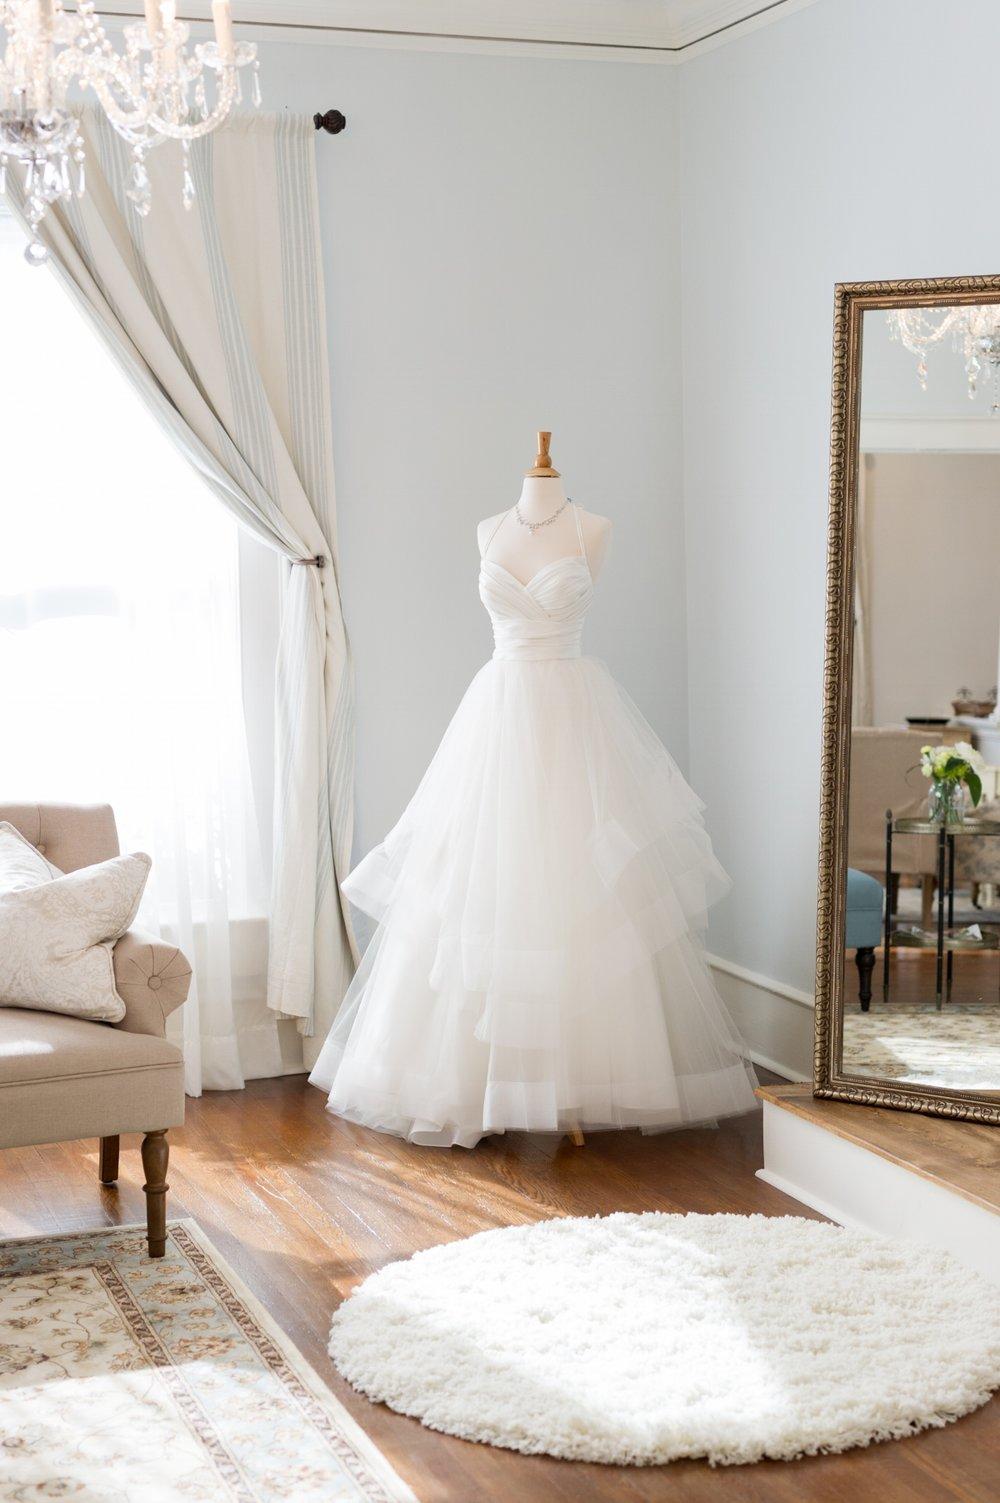 About — Atlanta Street Bridal Company